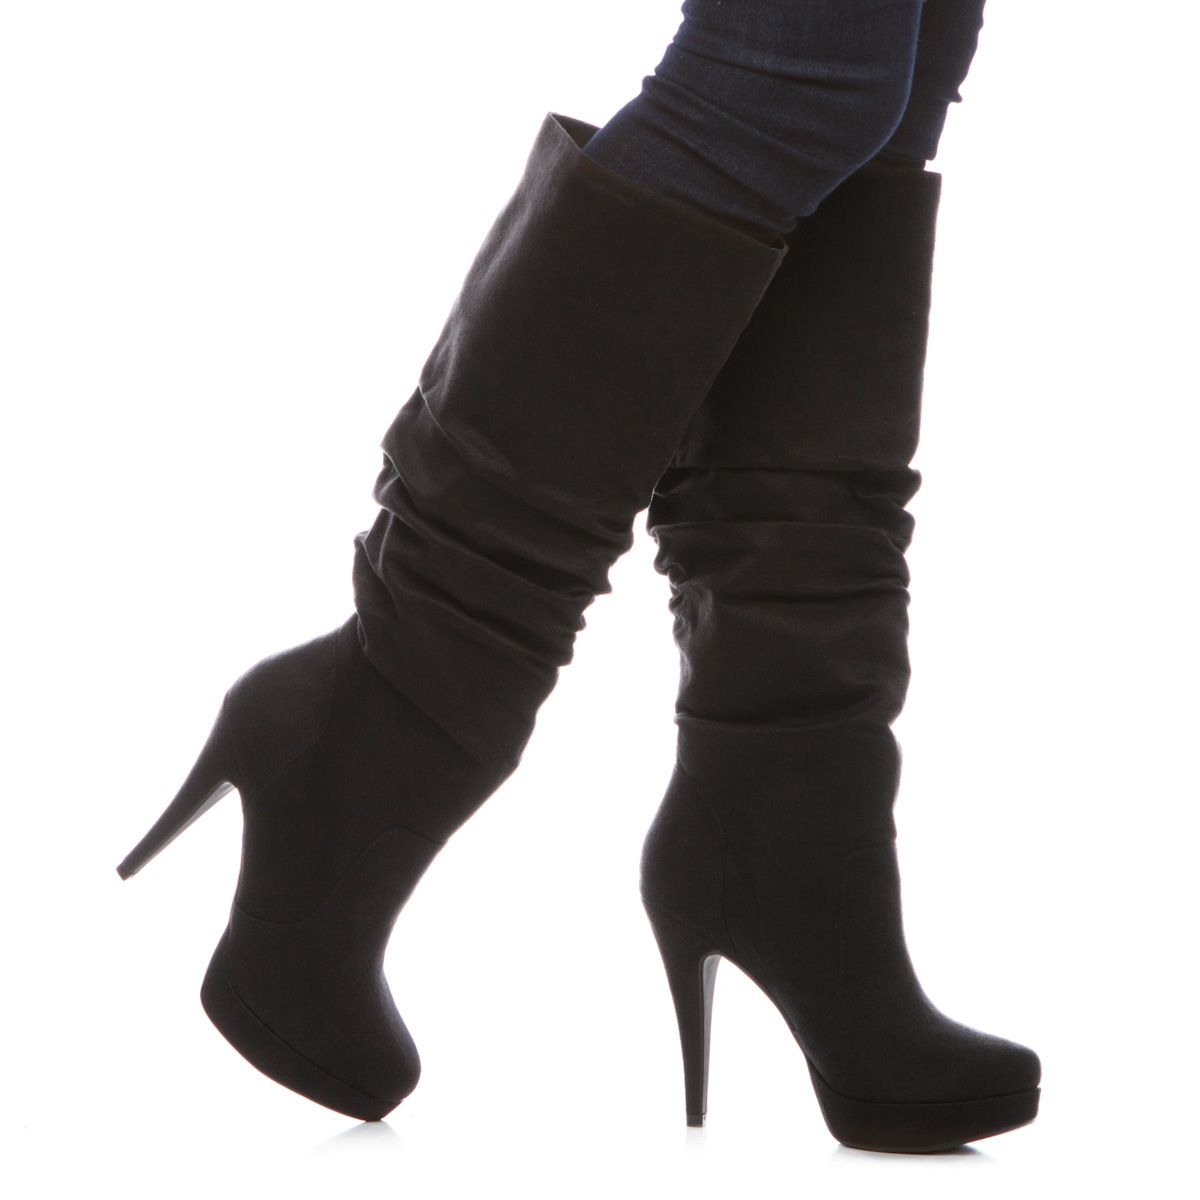 Izabel shoes